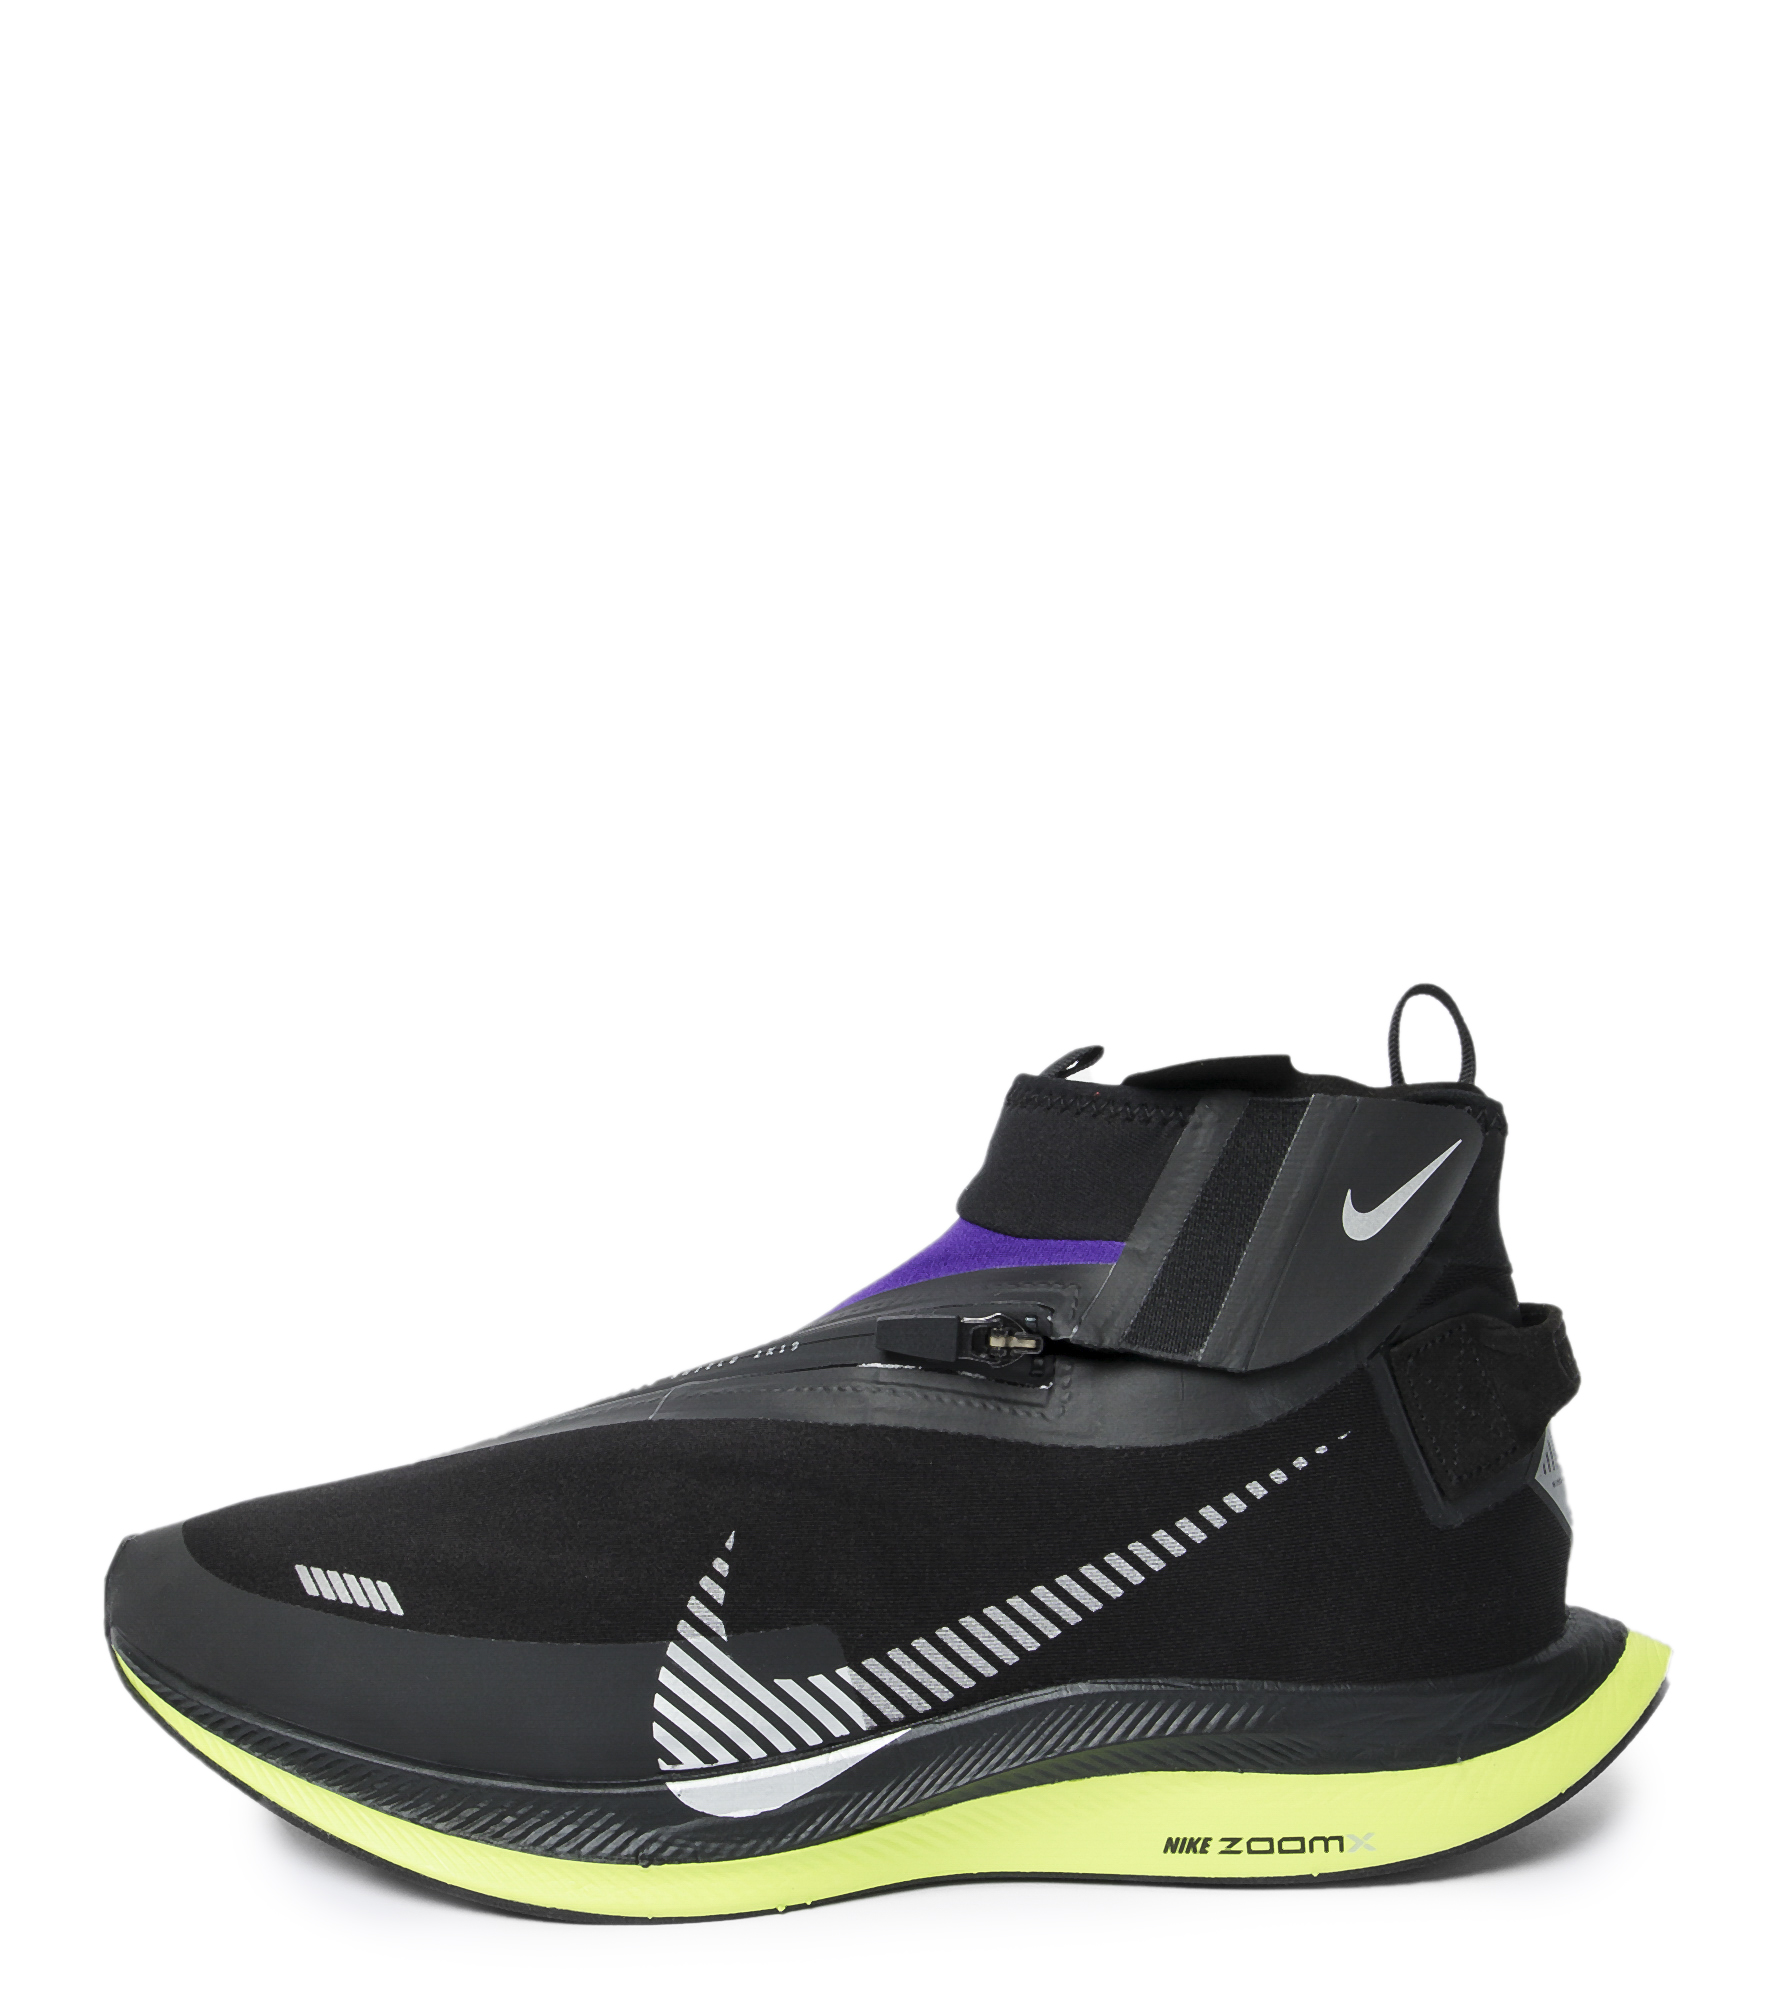 Nike Кроссовки мужские Zoom Pegasus Turbo Shield, размер 46,5